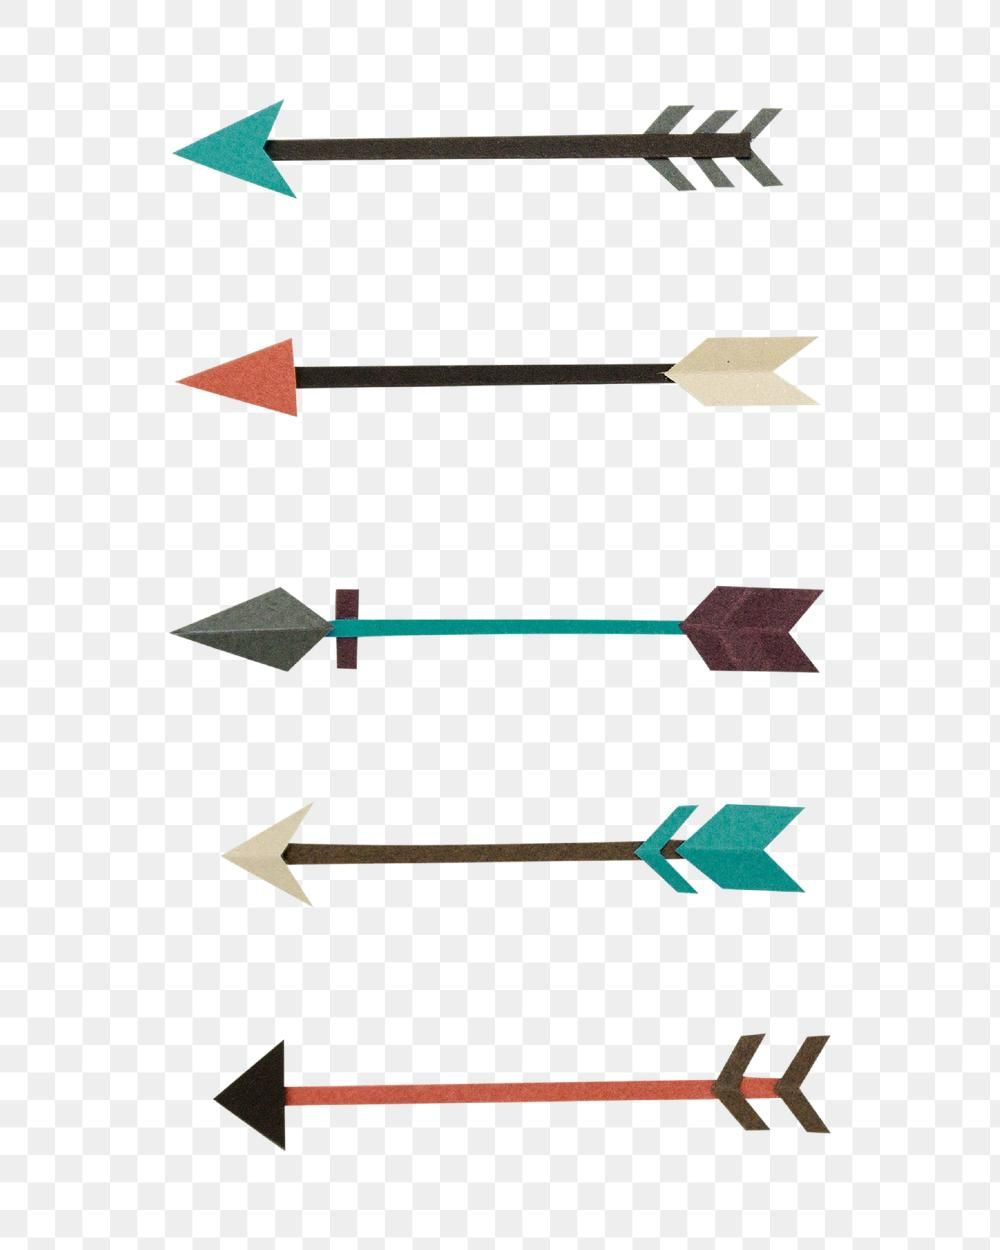 Arrow Symbol Paper Craft Set Design Element Free Image By Rawpixel Com Gade Technology Design Graphic Design Element Craft Set